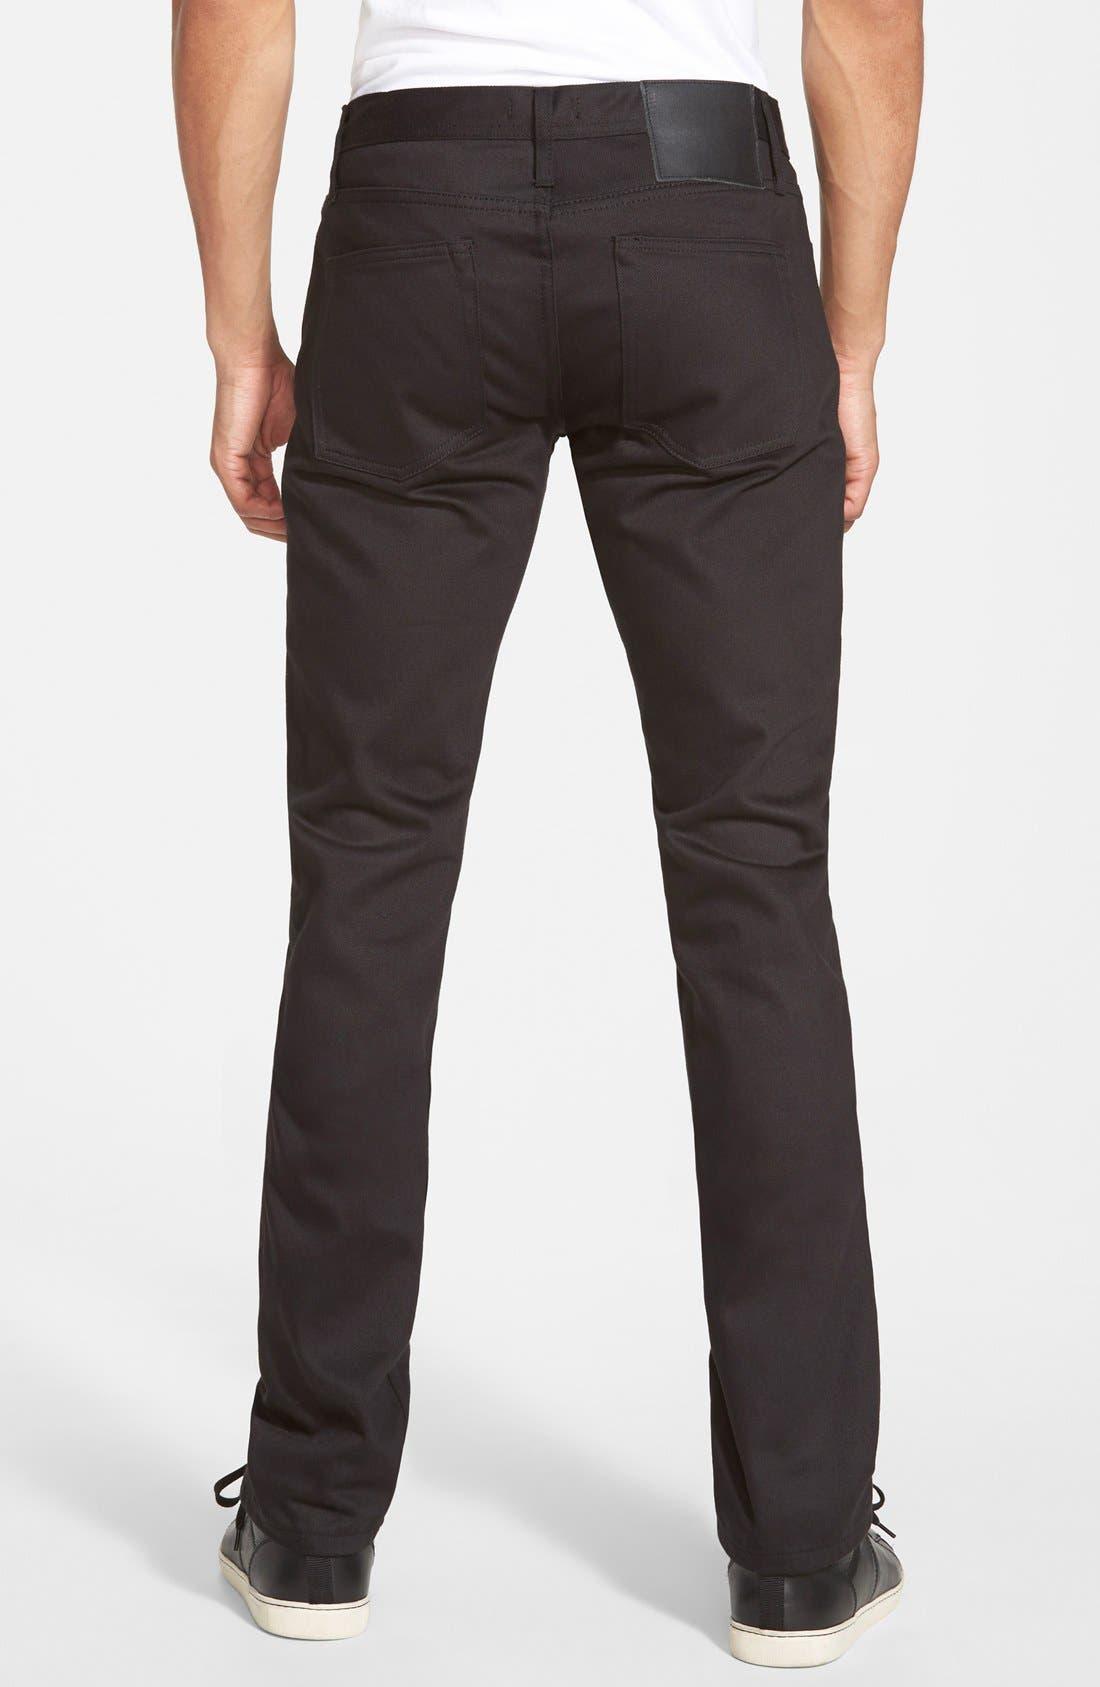 'UB155' Skinny Fit Raw Selvedge Jeans,                             Alternate thumbnail 2, color,                             001